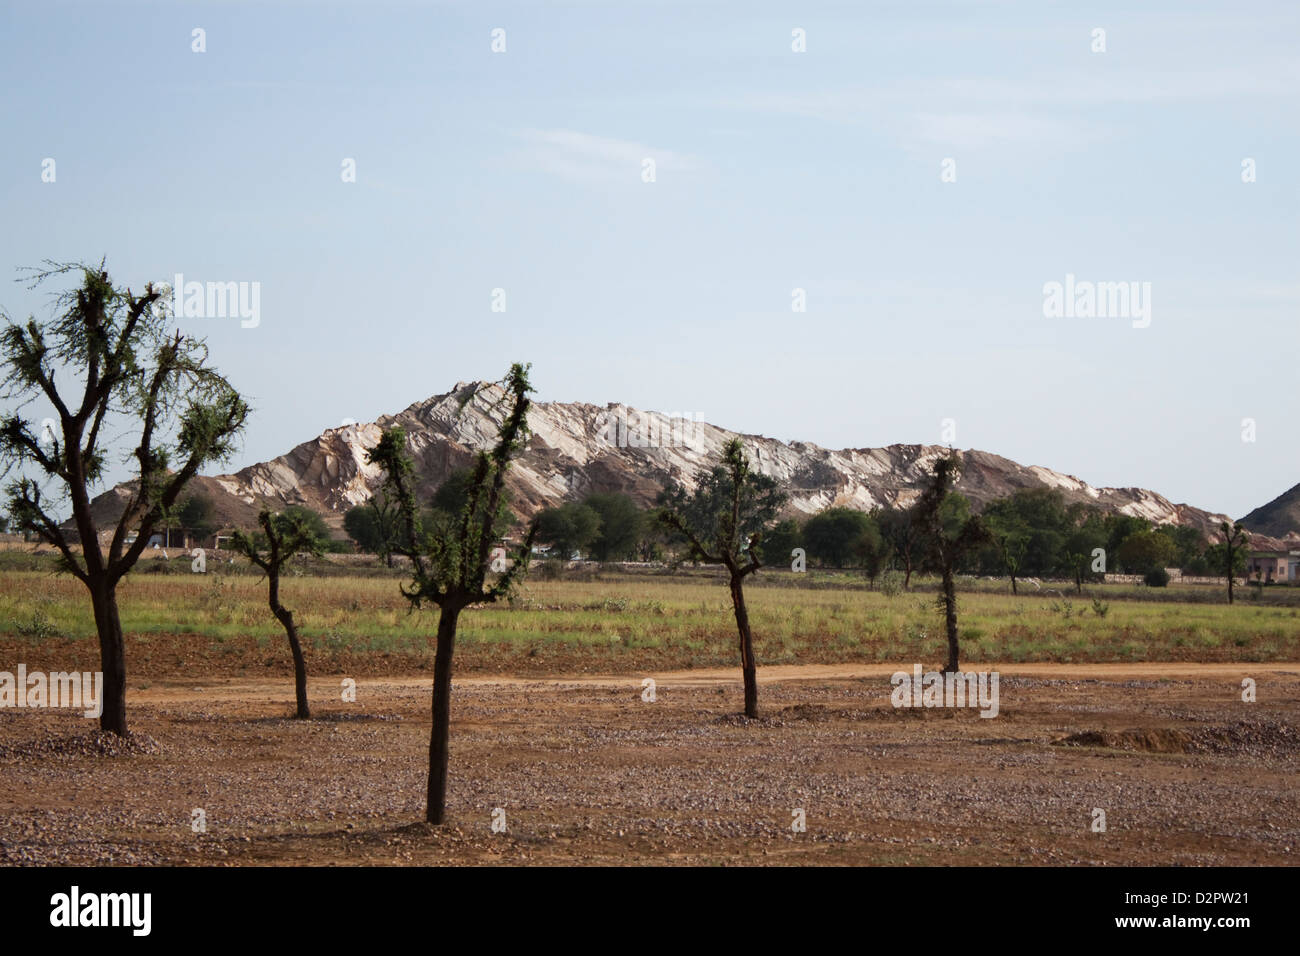 Tree with a mountain range, Ahmedabad, Gujarat, India - Stock Image